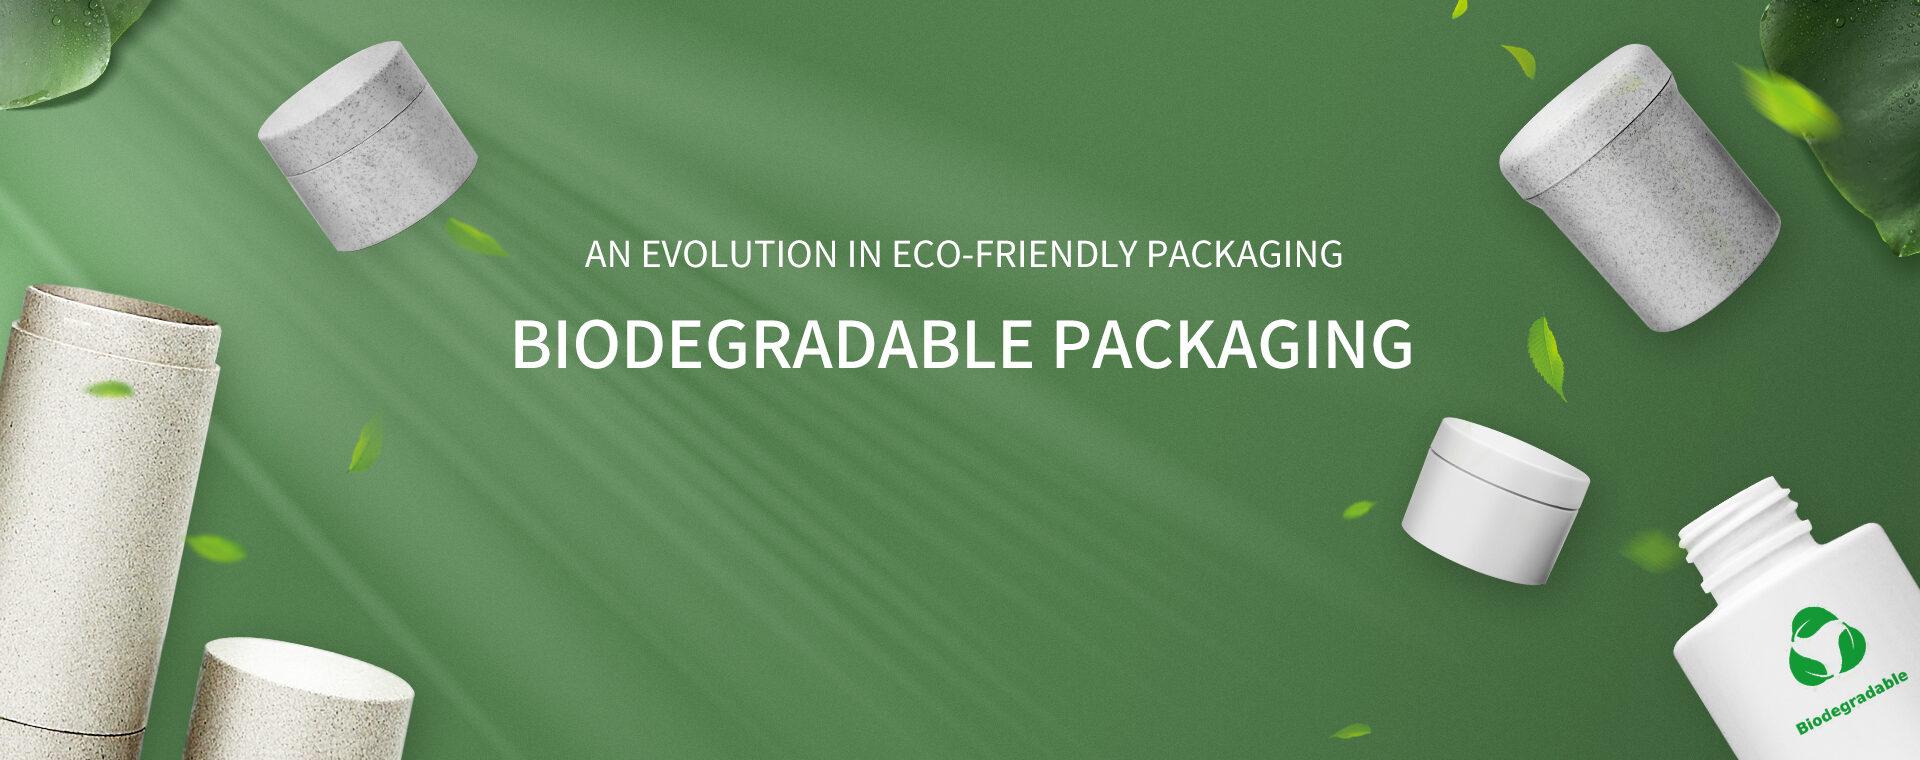 Biodegradable